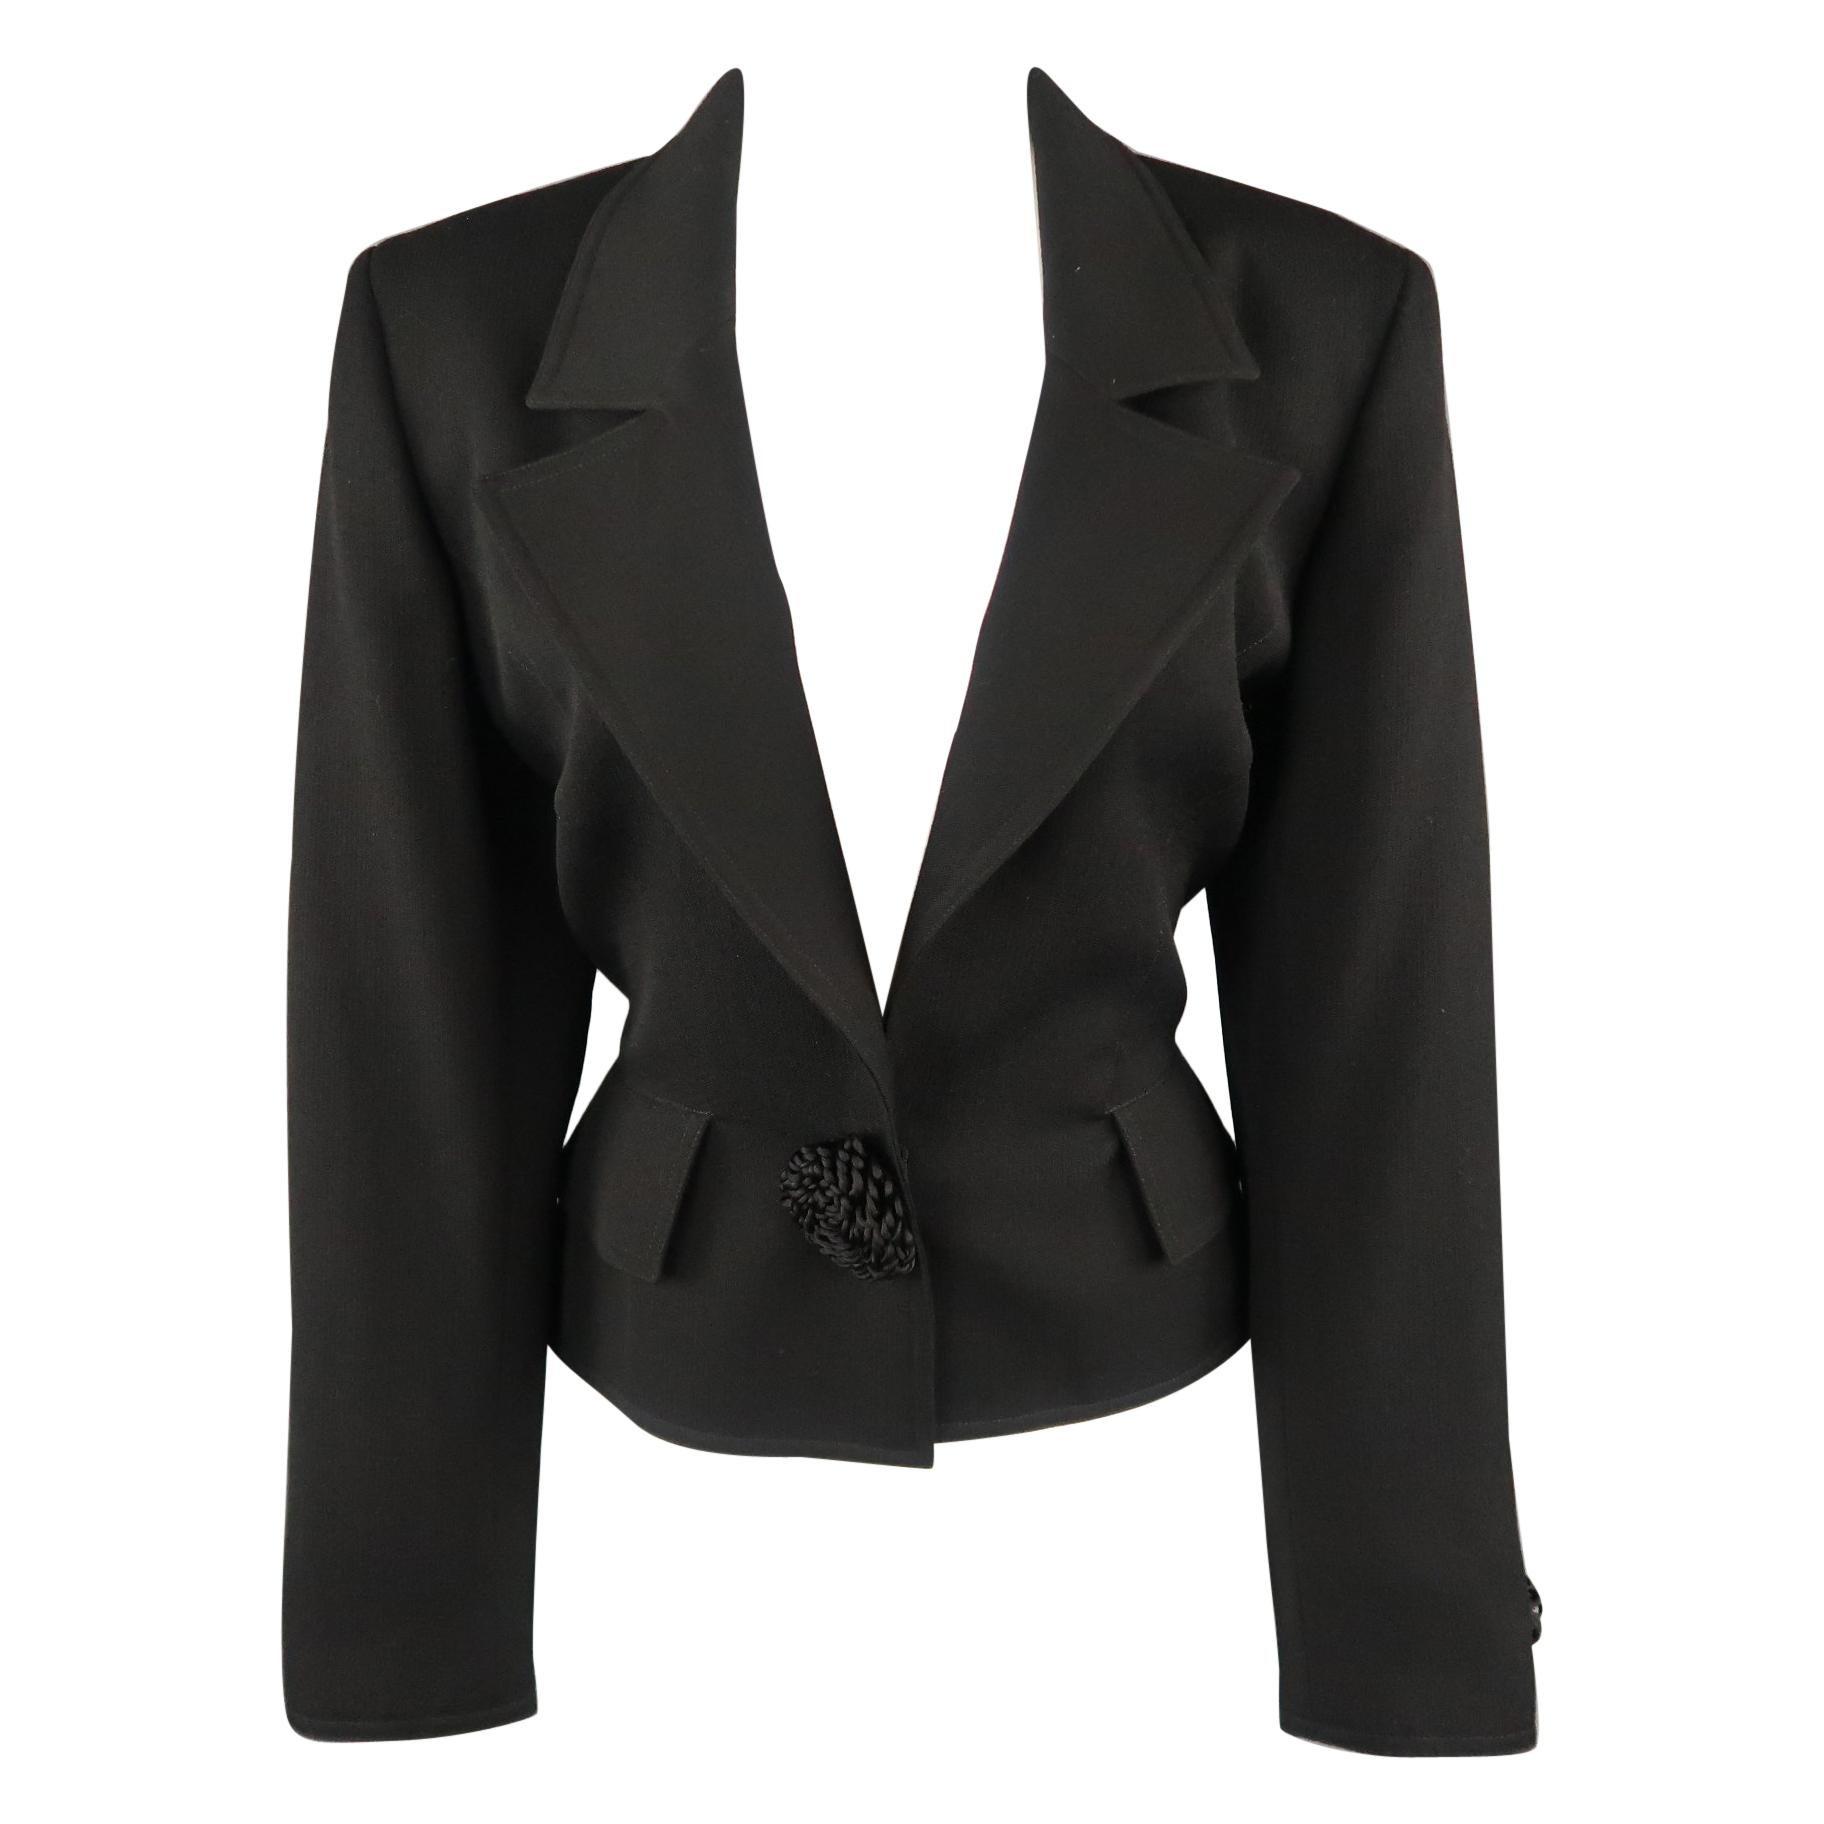 4c69b9324574 Vintage Valentino Jackets - 114 For Sale at 1stdibs